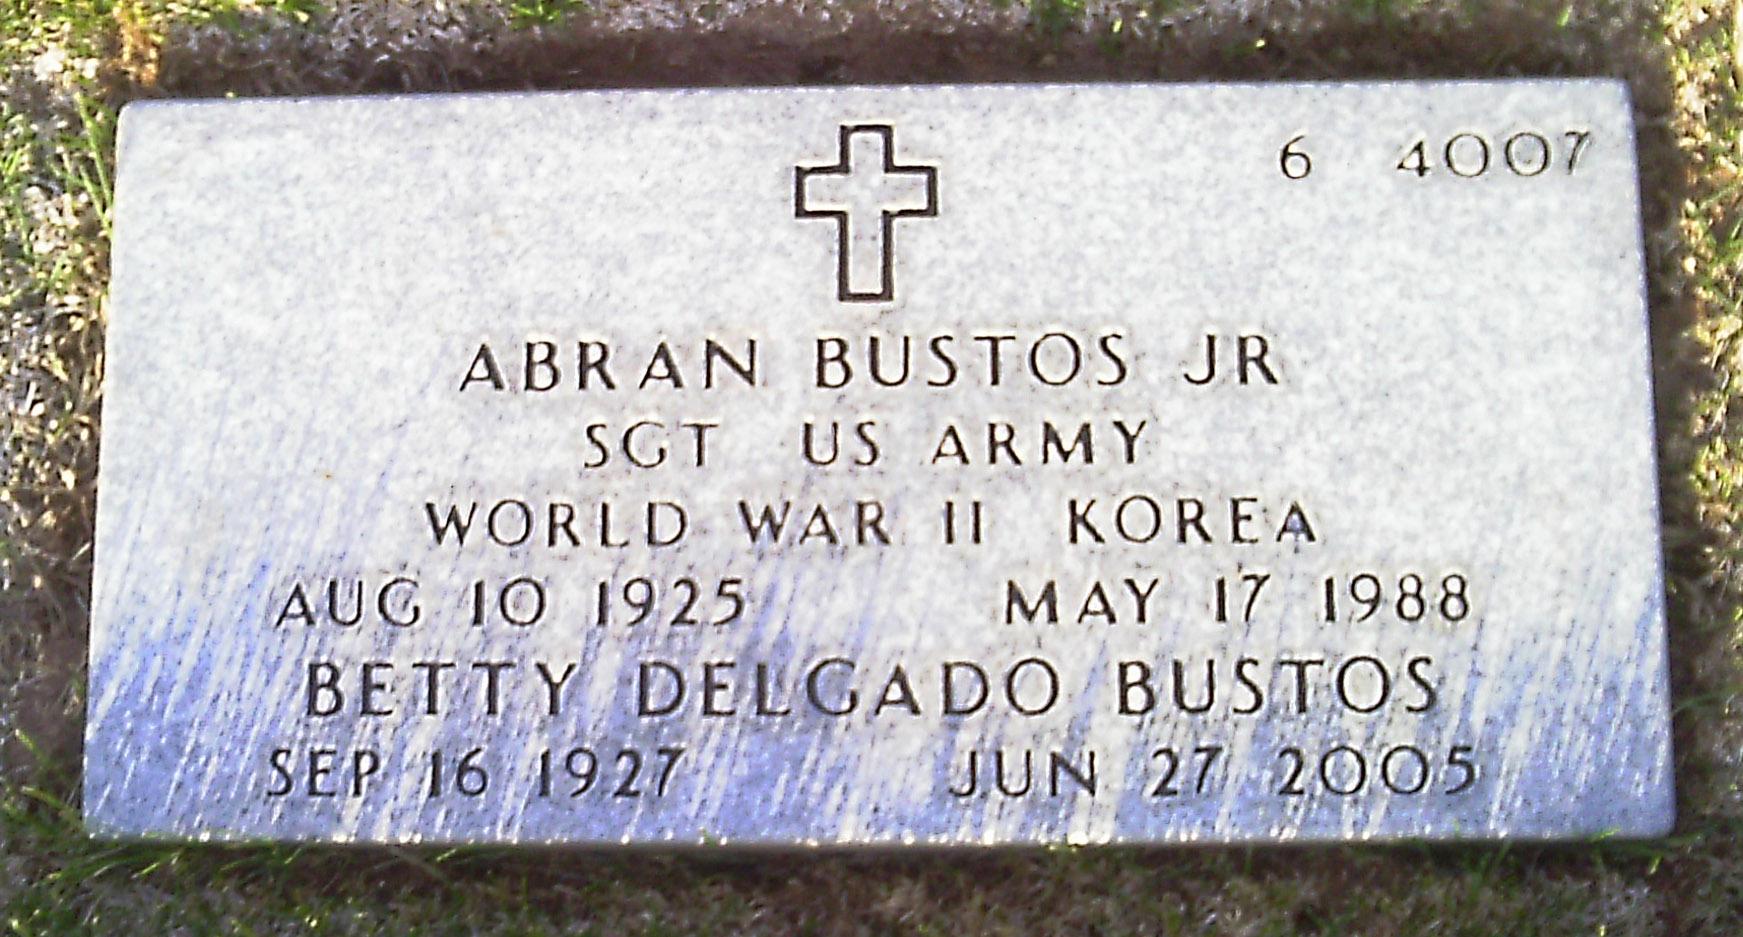 Sgt Abran Bustos, Jr